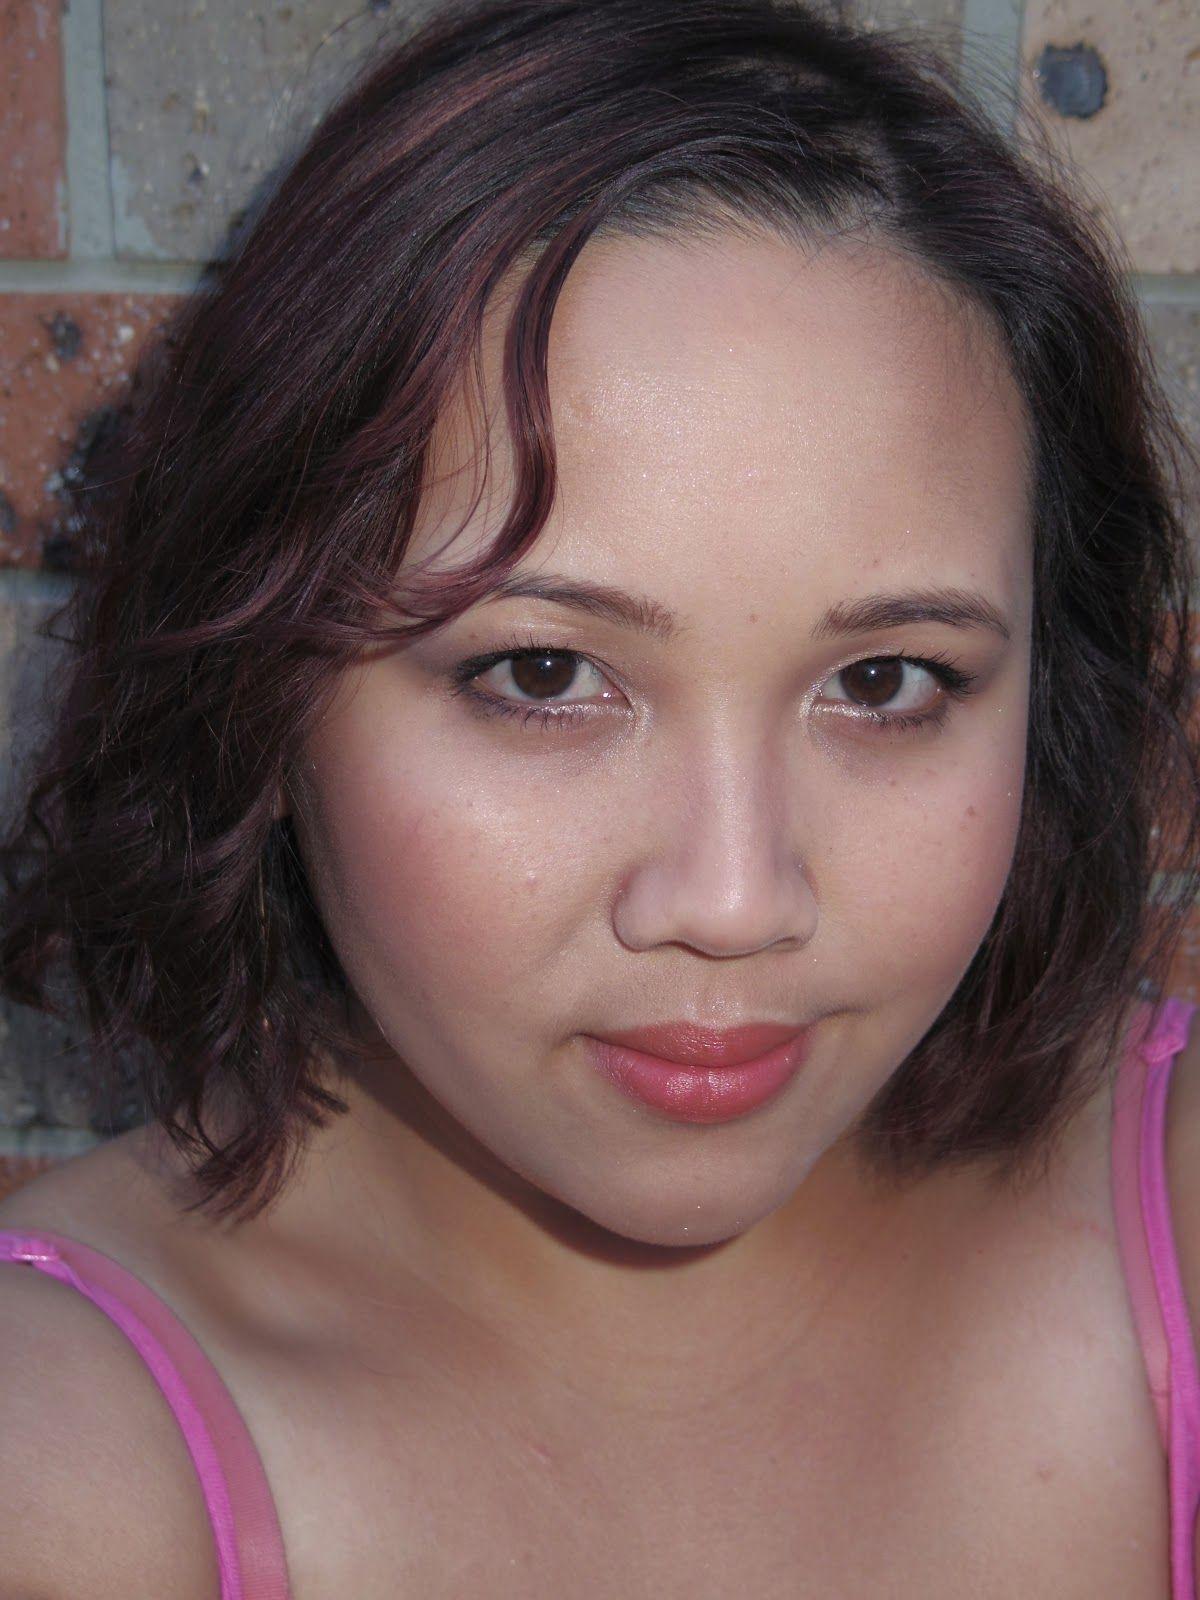 Pinterestnahizzle9 Skin makeup, Makeup looks, Nikkie